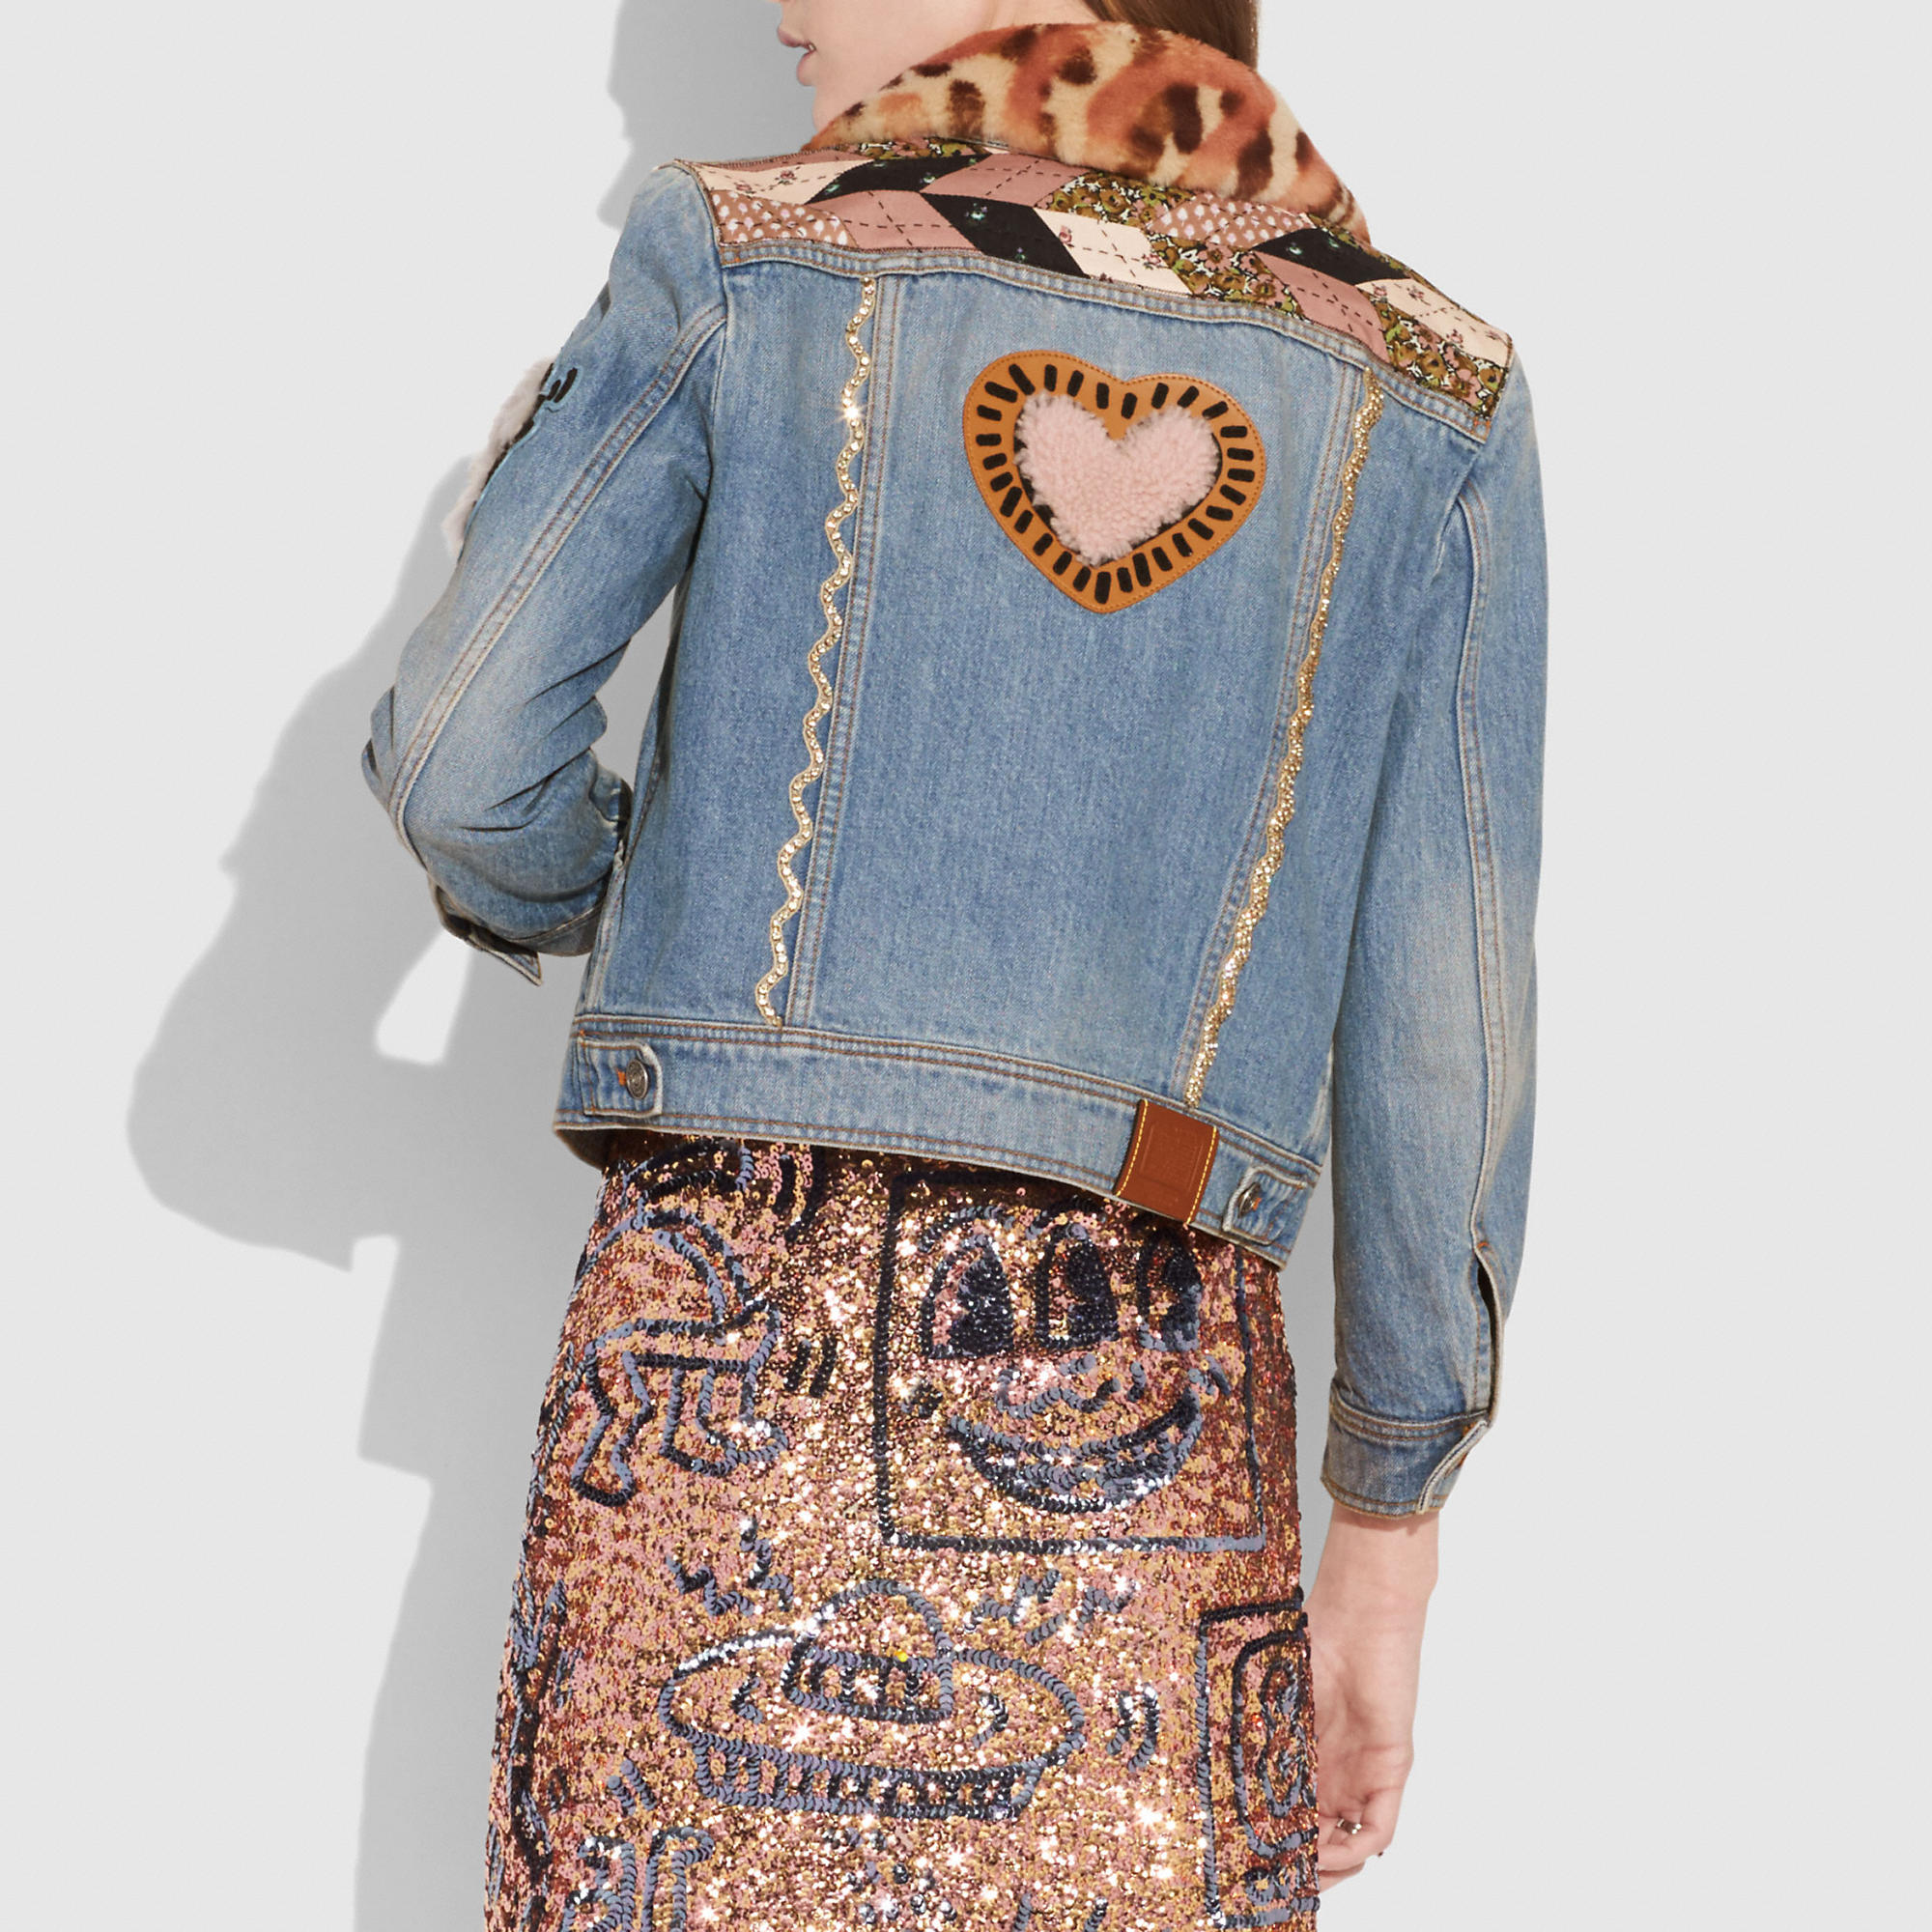 Women S Jackets Coats Outerwear Coach Jackets Denim Jacket Upcycle Clothes [ 2000 x 2000 Pixel ]